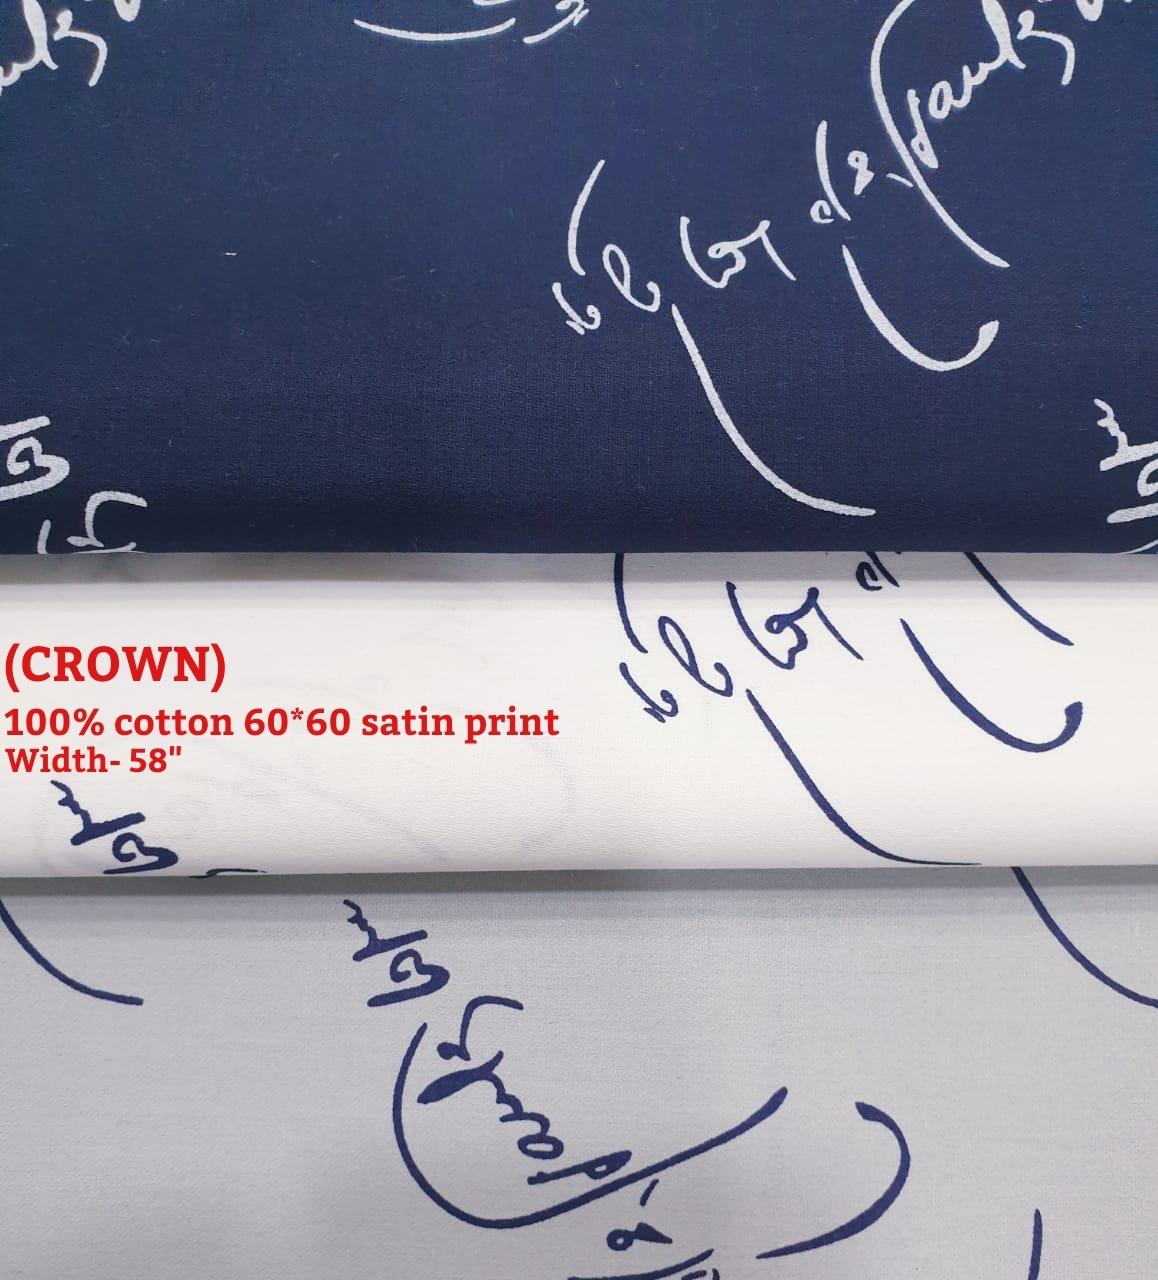 CROWN 100% cotton 60*60 satin fabric